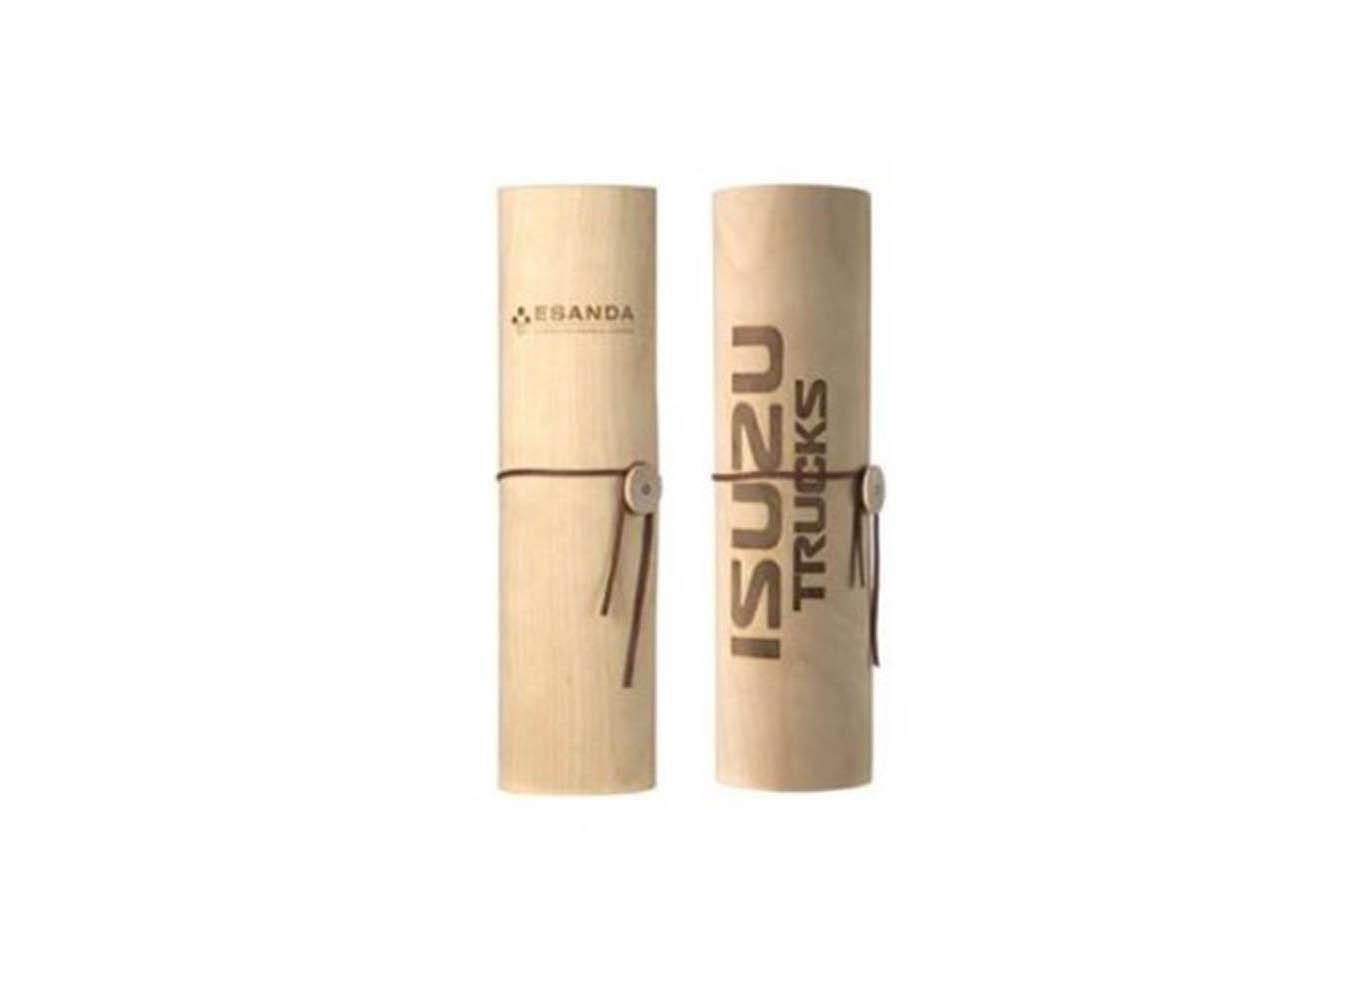 Custom Printed Wooden Wine Bottle Cylinder Tube Box